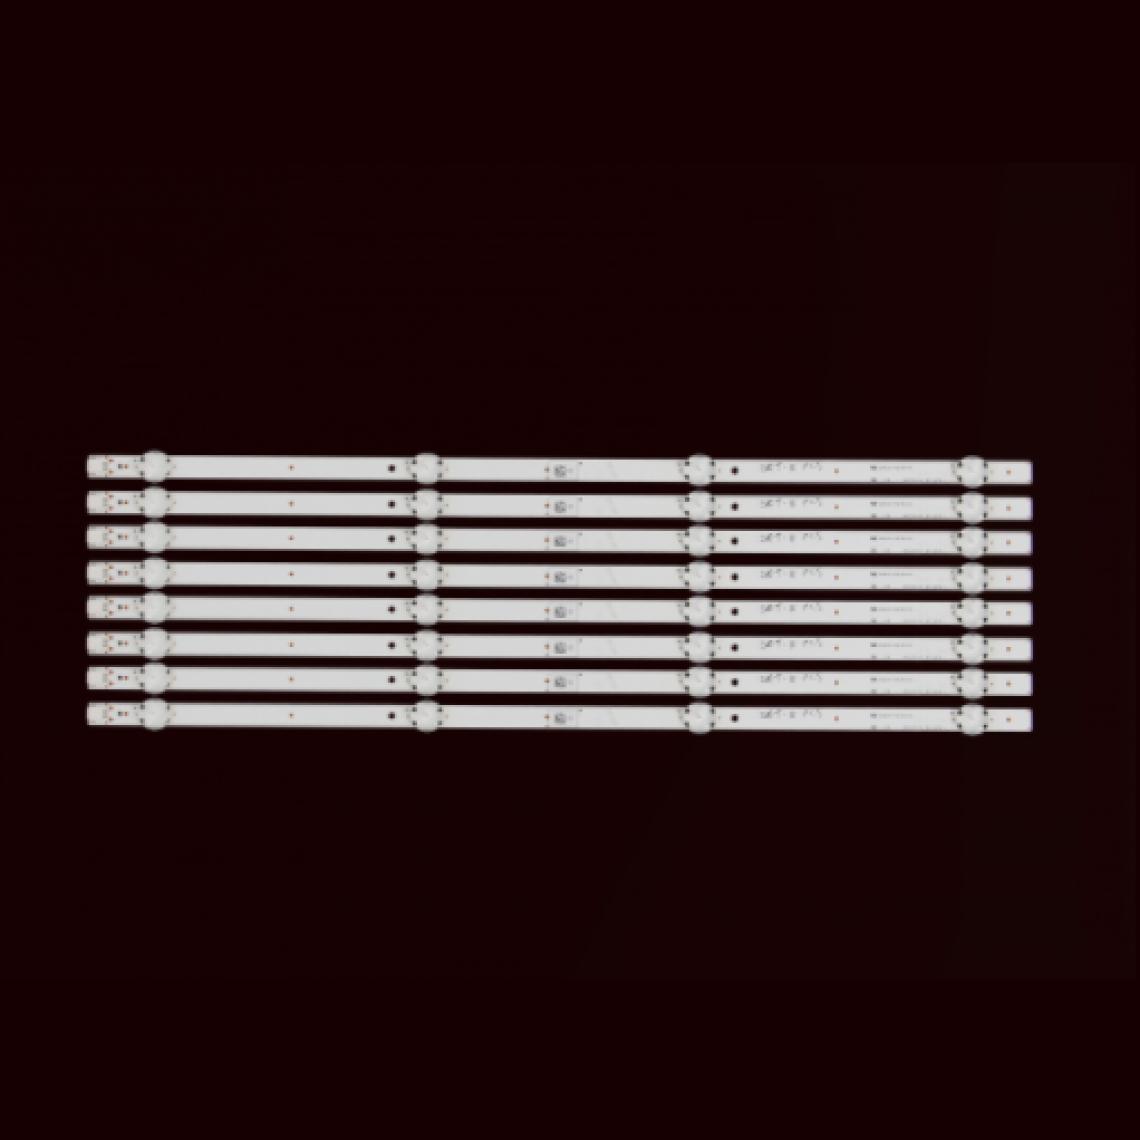 ARCELIK 49'' DRT_REV0.1 - ZVA65600-AA , ZVE65600 , 49 CRYSTAL 8X4 LED BAR